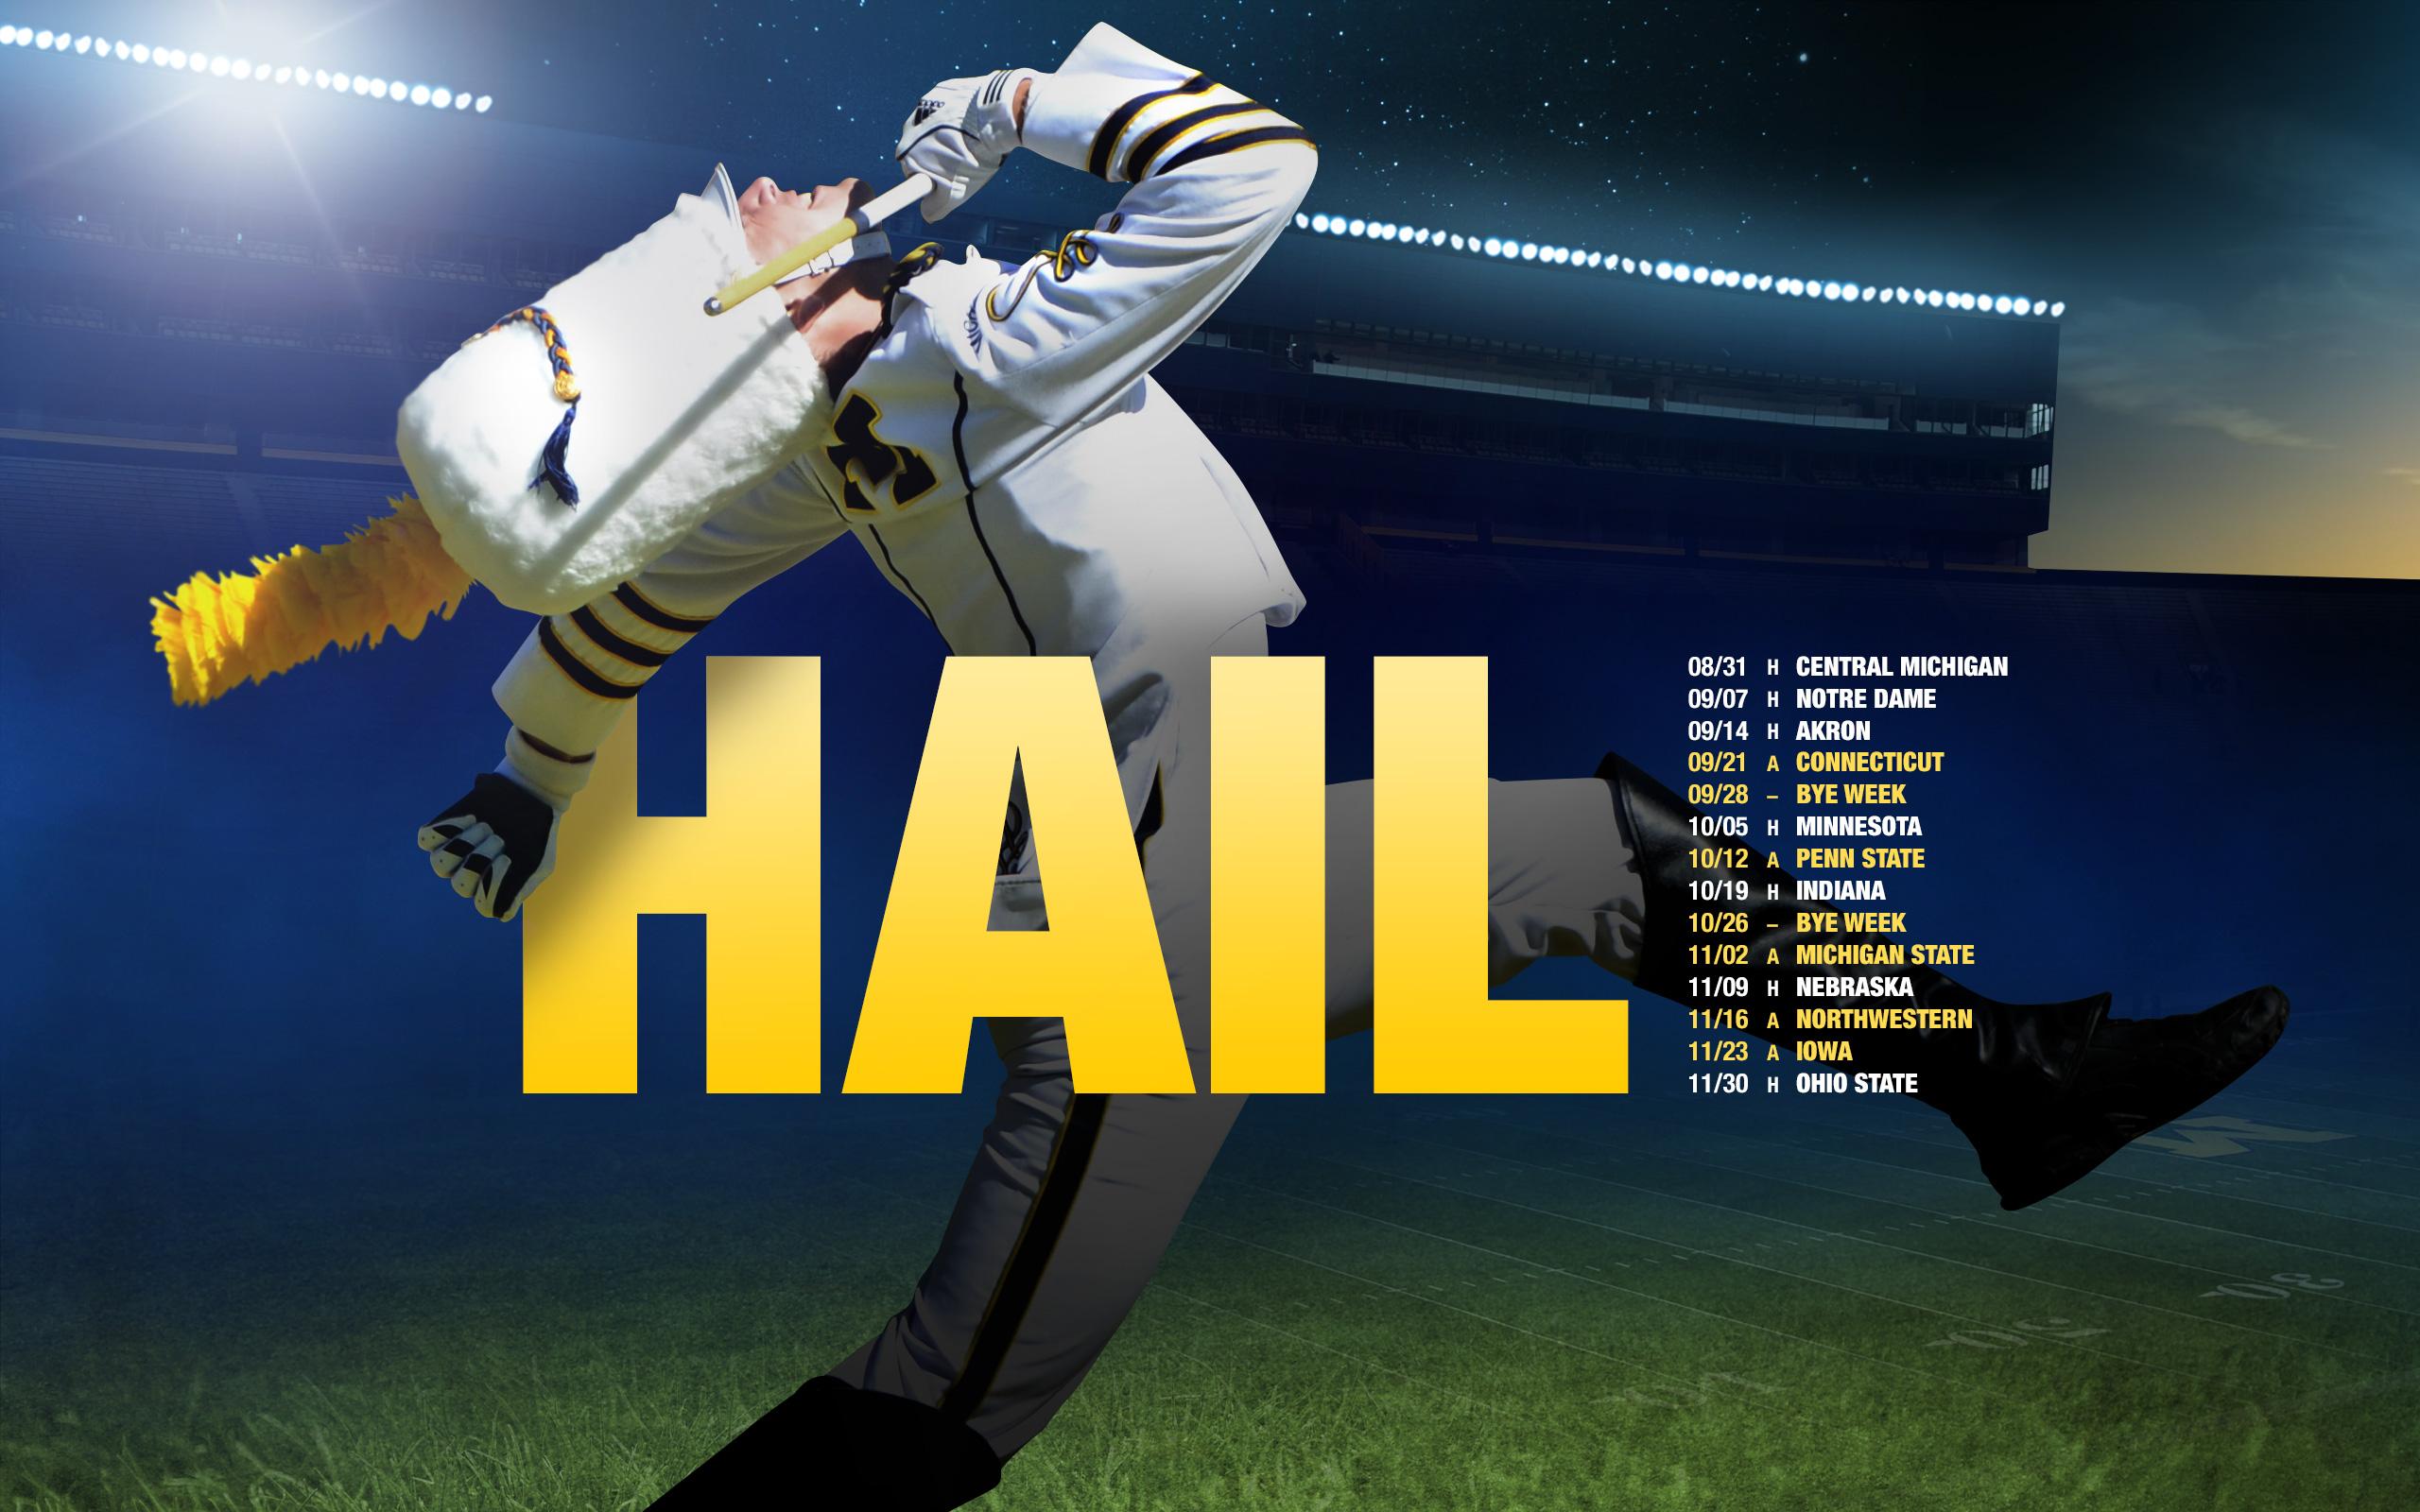 toward children ncaa division i Michigan State 2013 Football Schedule 2560x1600